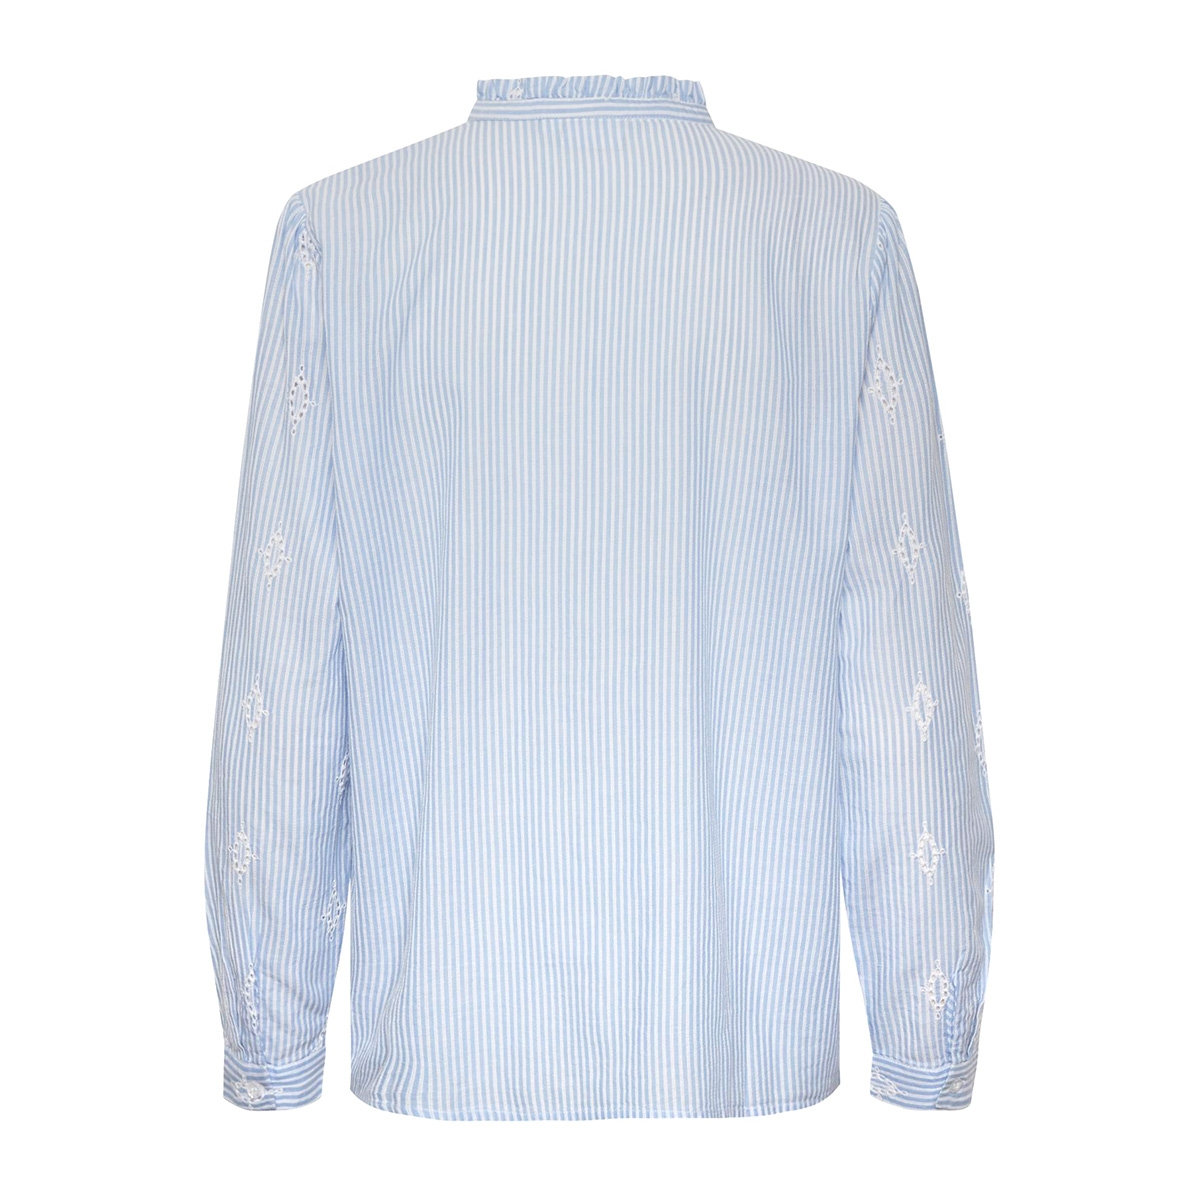 paulasz blouse 30510239 saint tropez blouse 110605